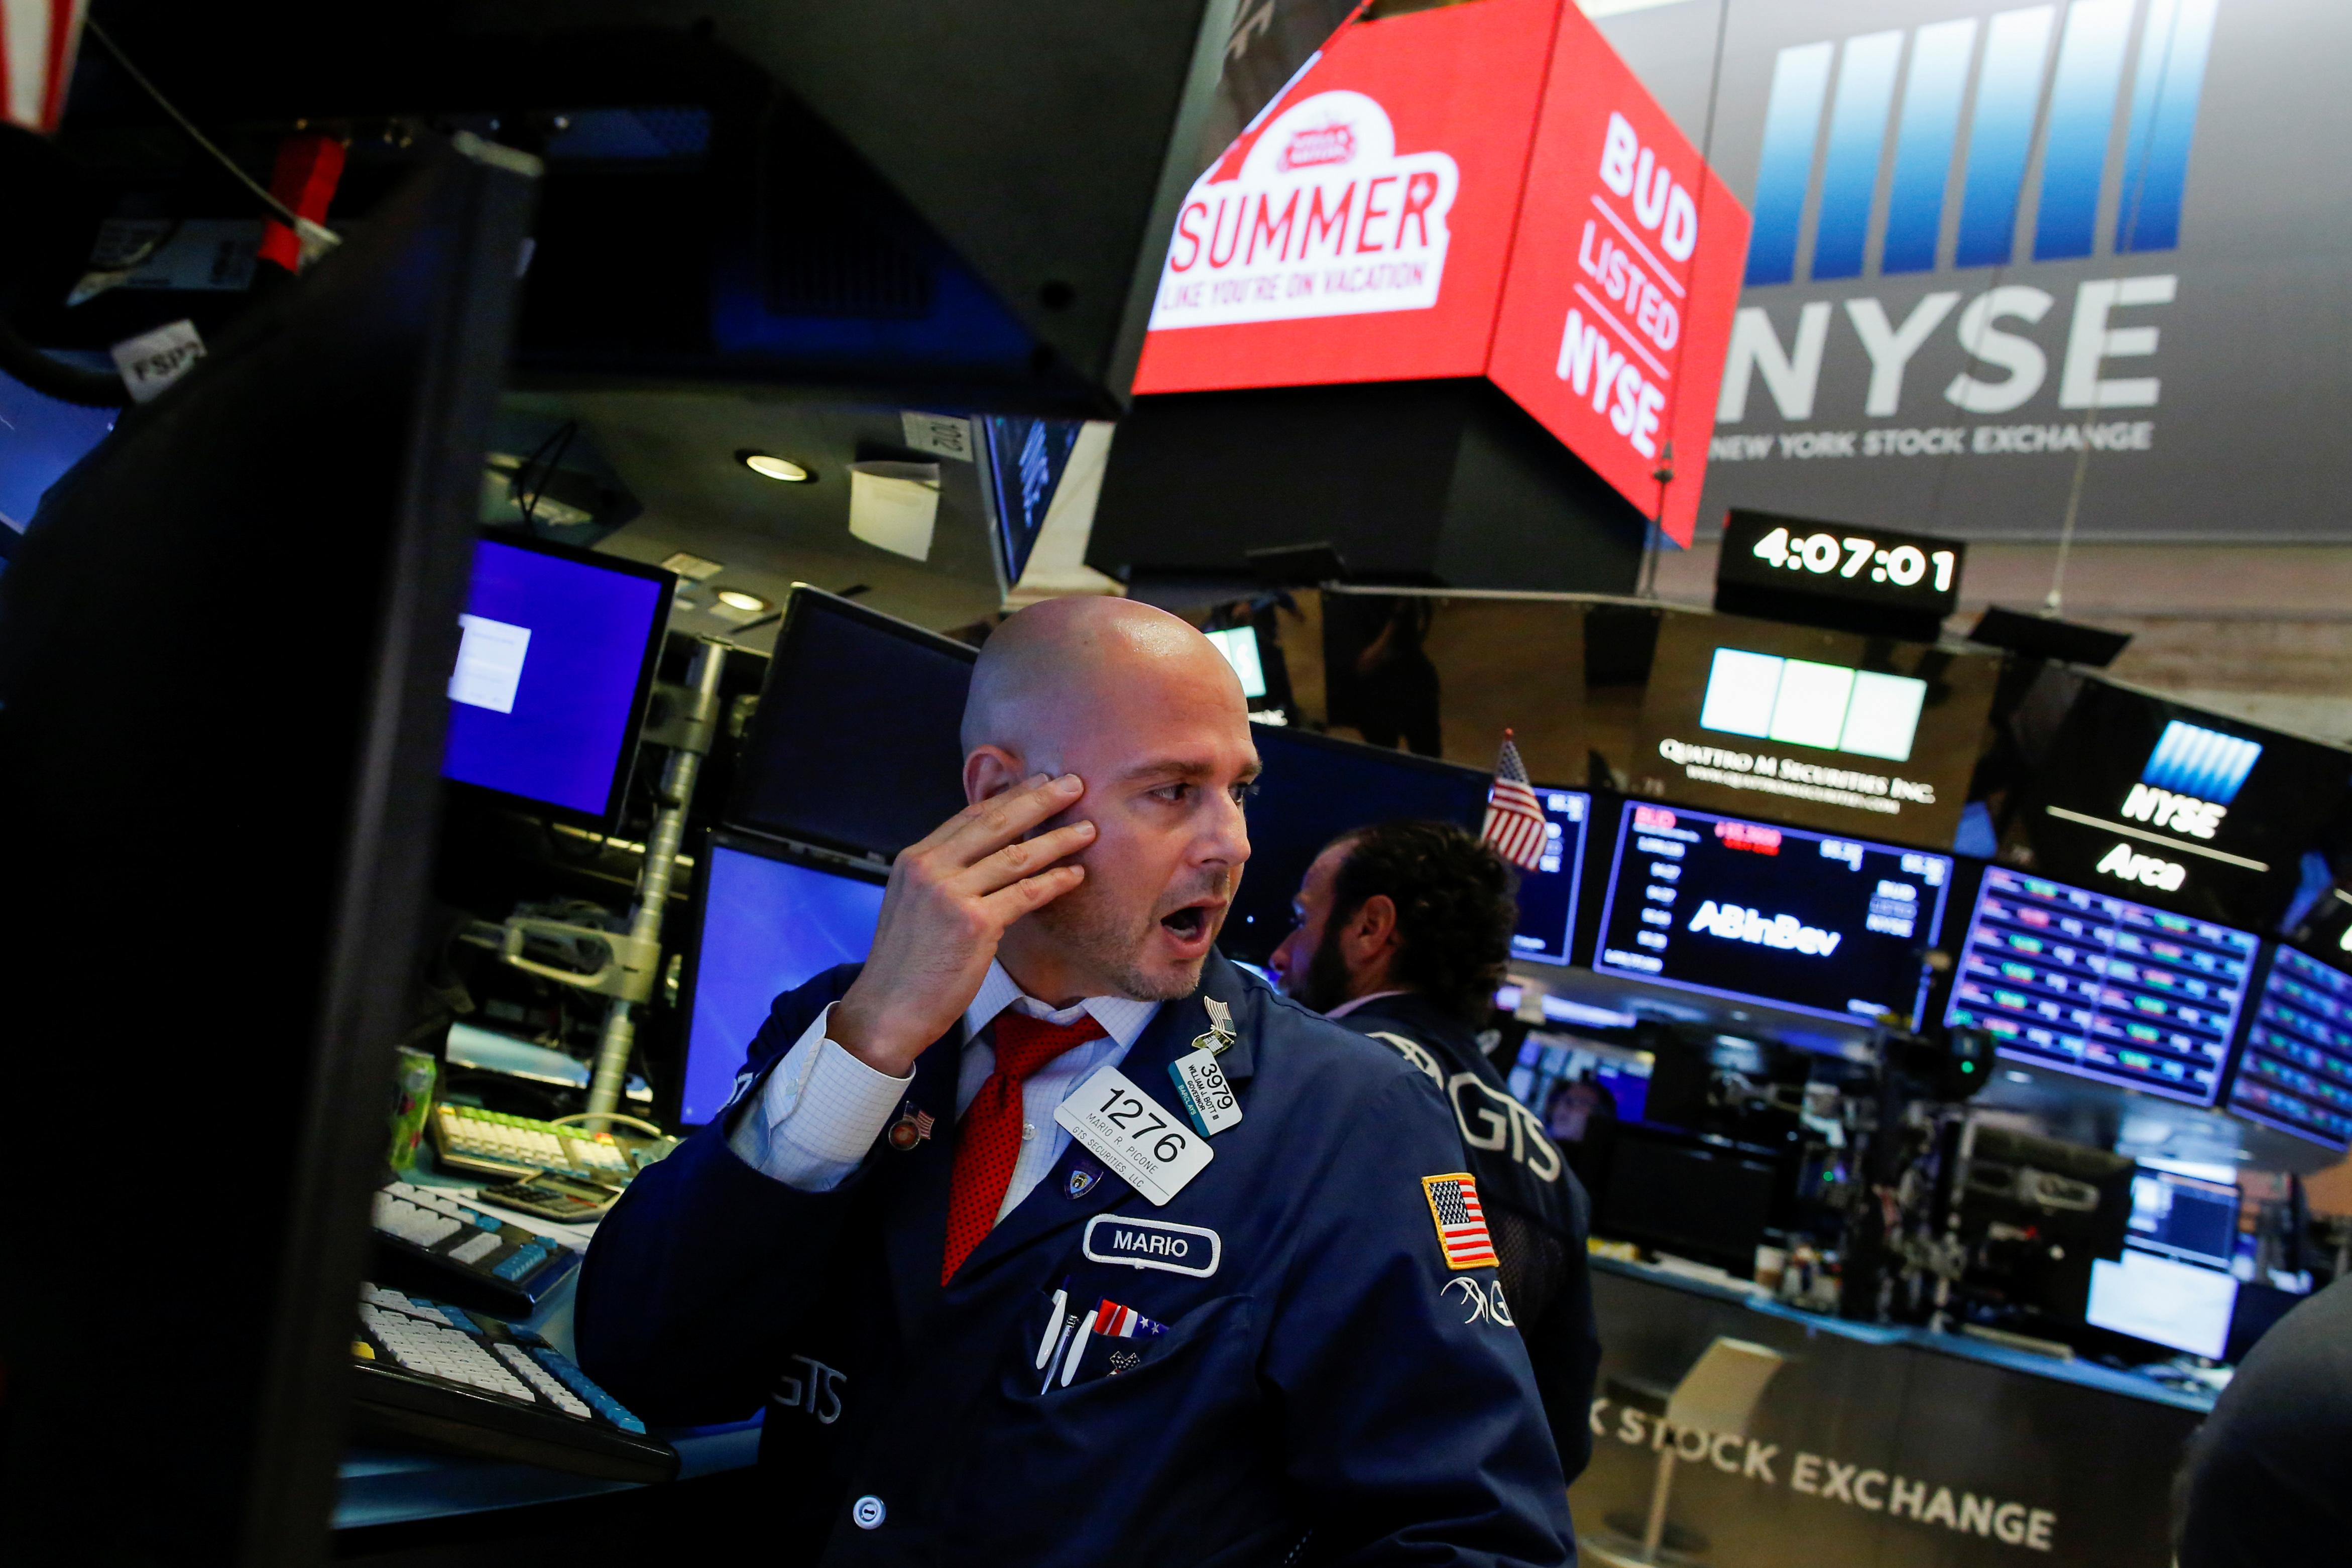 Stocks edge lower as investors eye Fed's Jackson Hole meeting